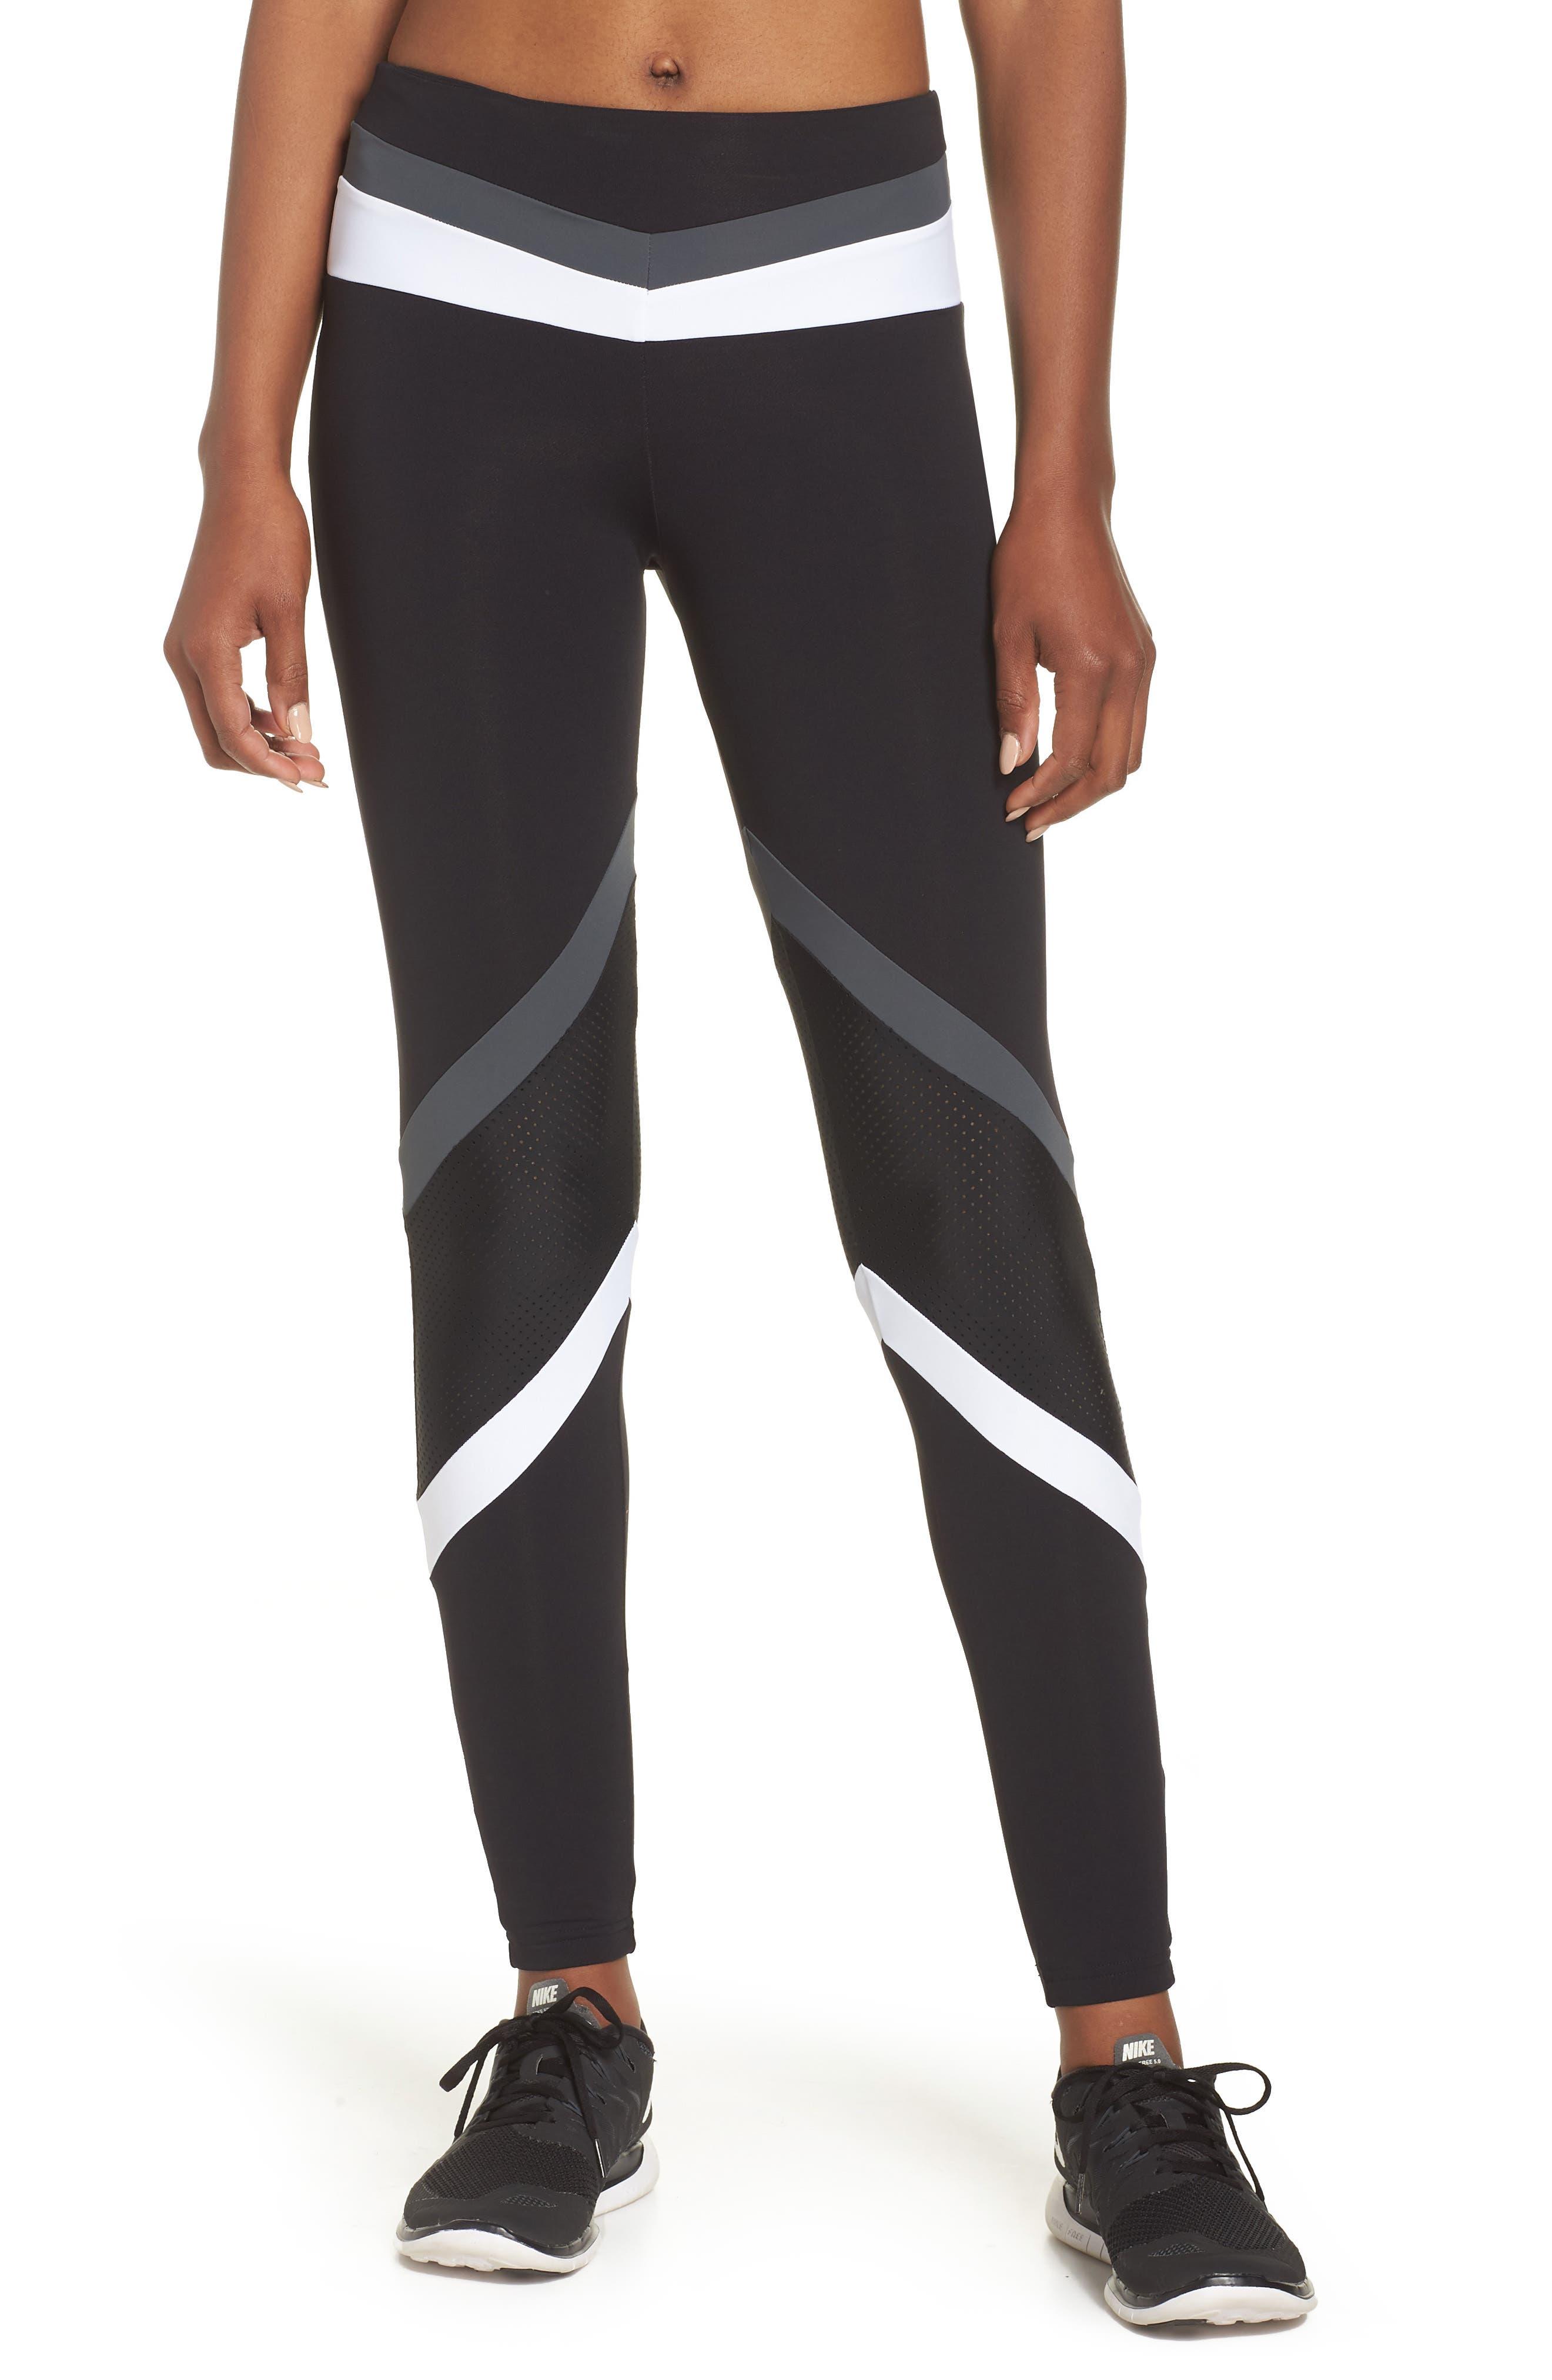 BoomBoom Athletica Leggings,                         Main,                         color, Black/ Grey/ White